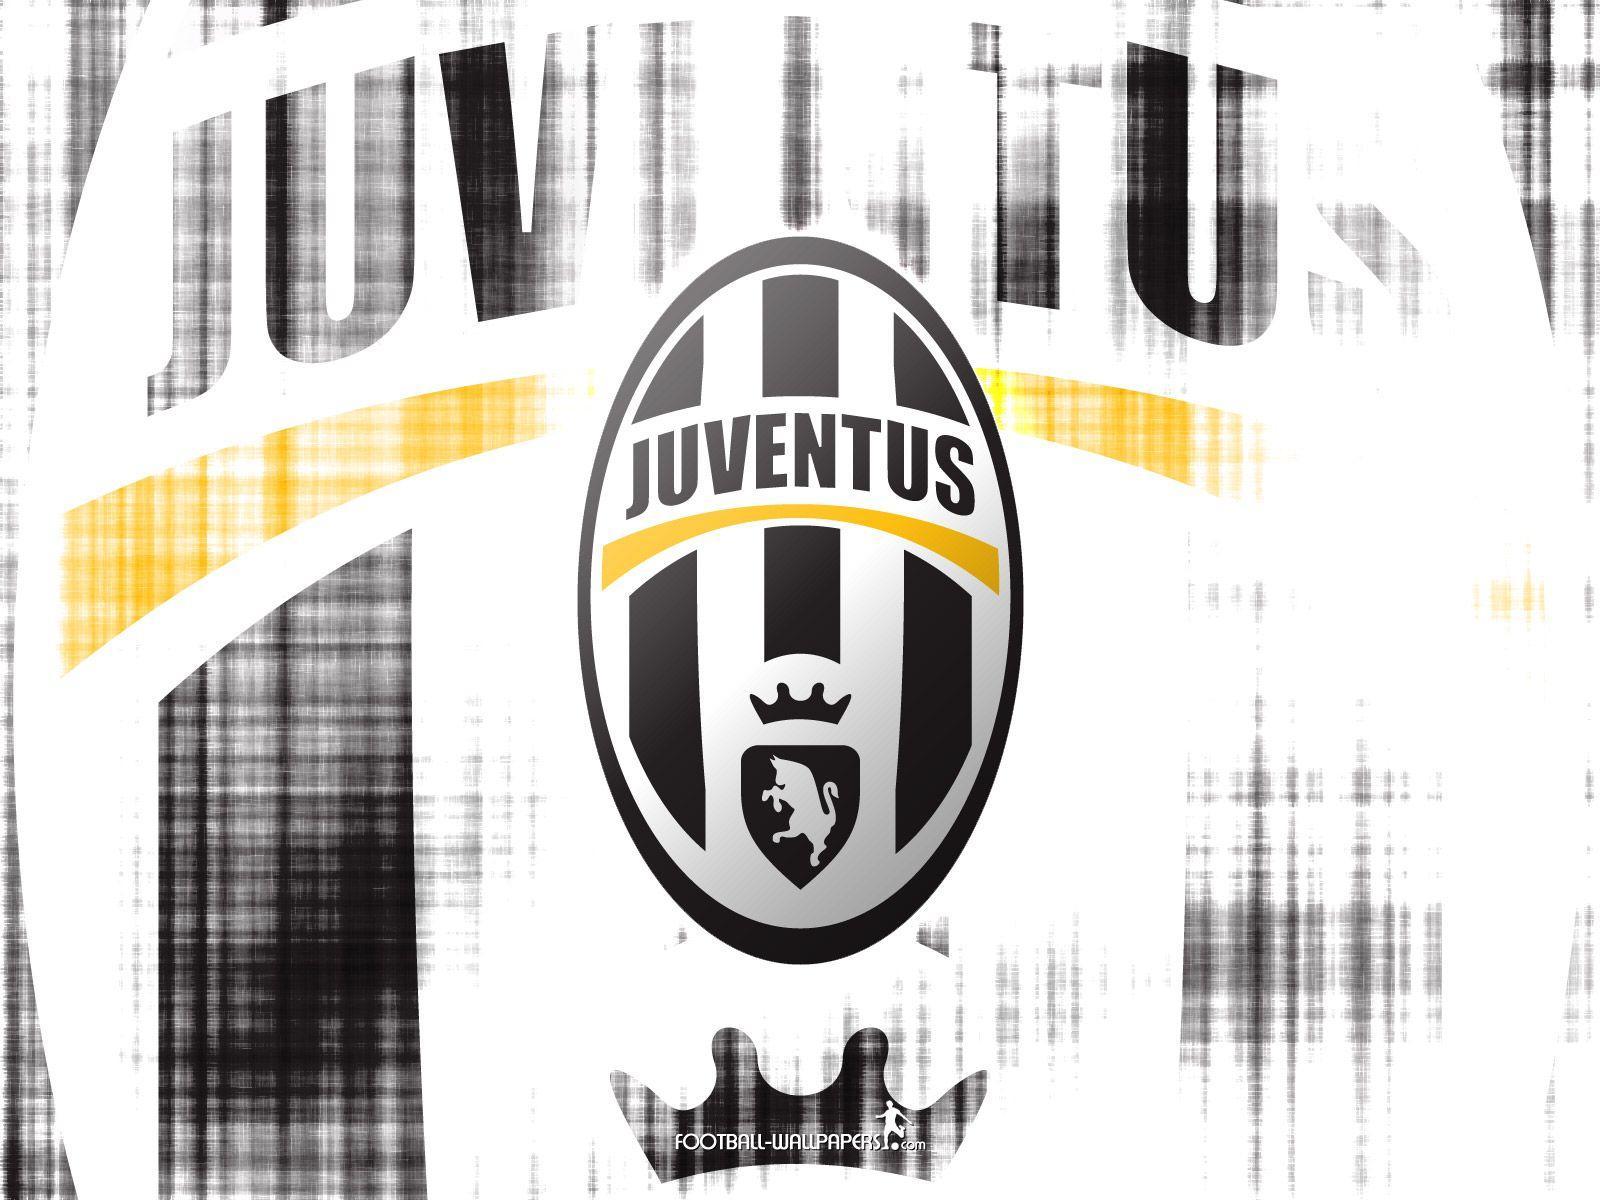 Juventus Wallpaper #1 | Football Wallpapers and Videos